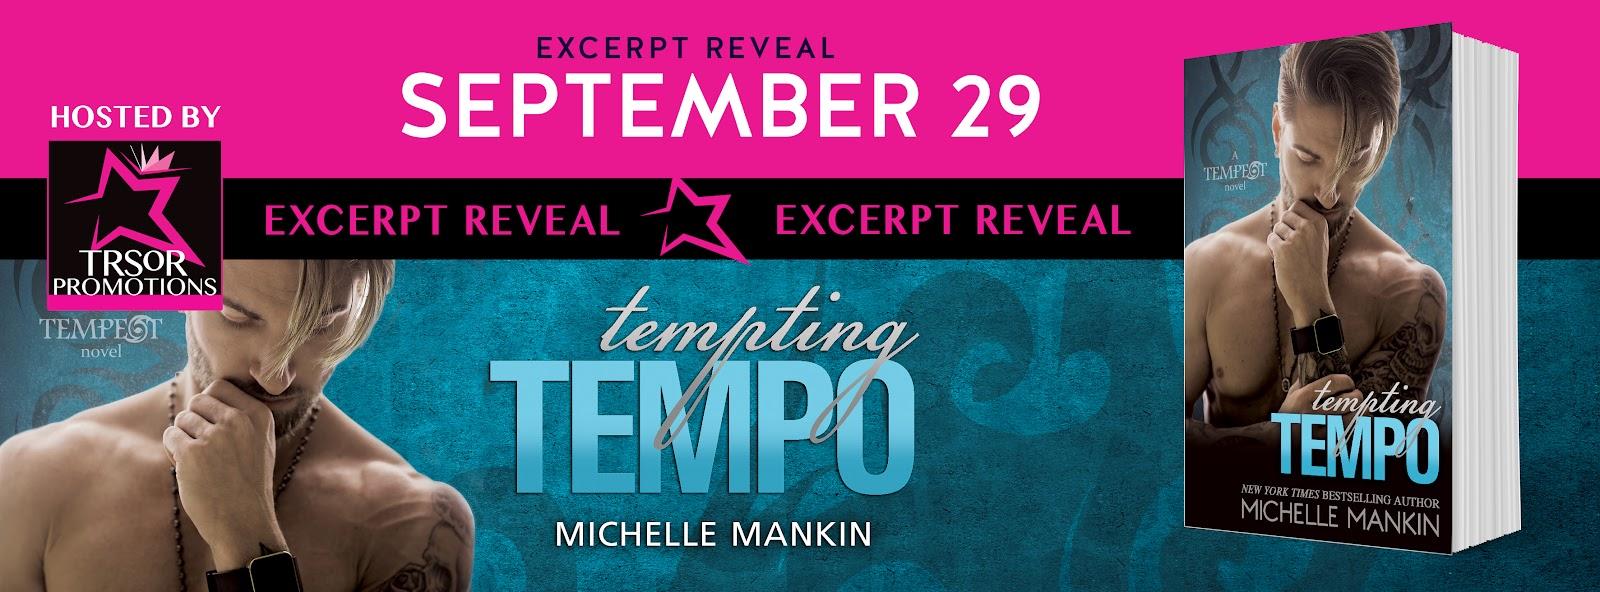 TEMPTING_TEMPO_EXCERPT.jpg